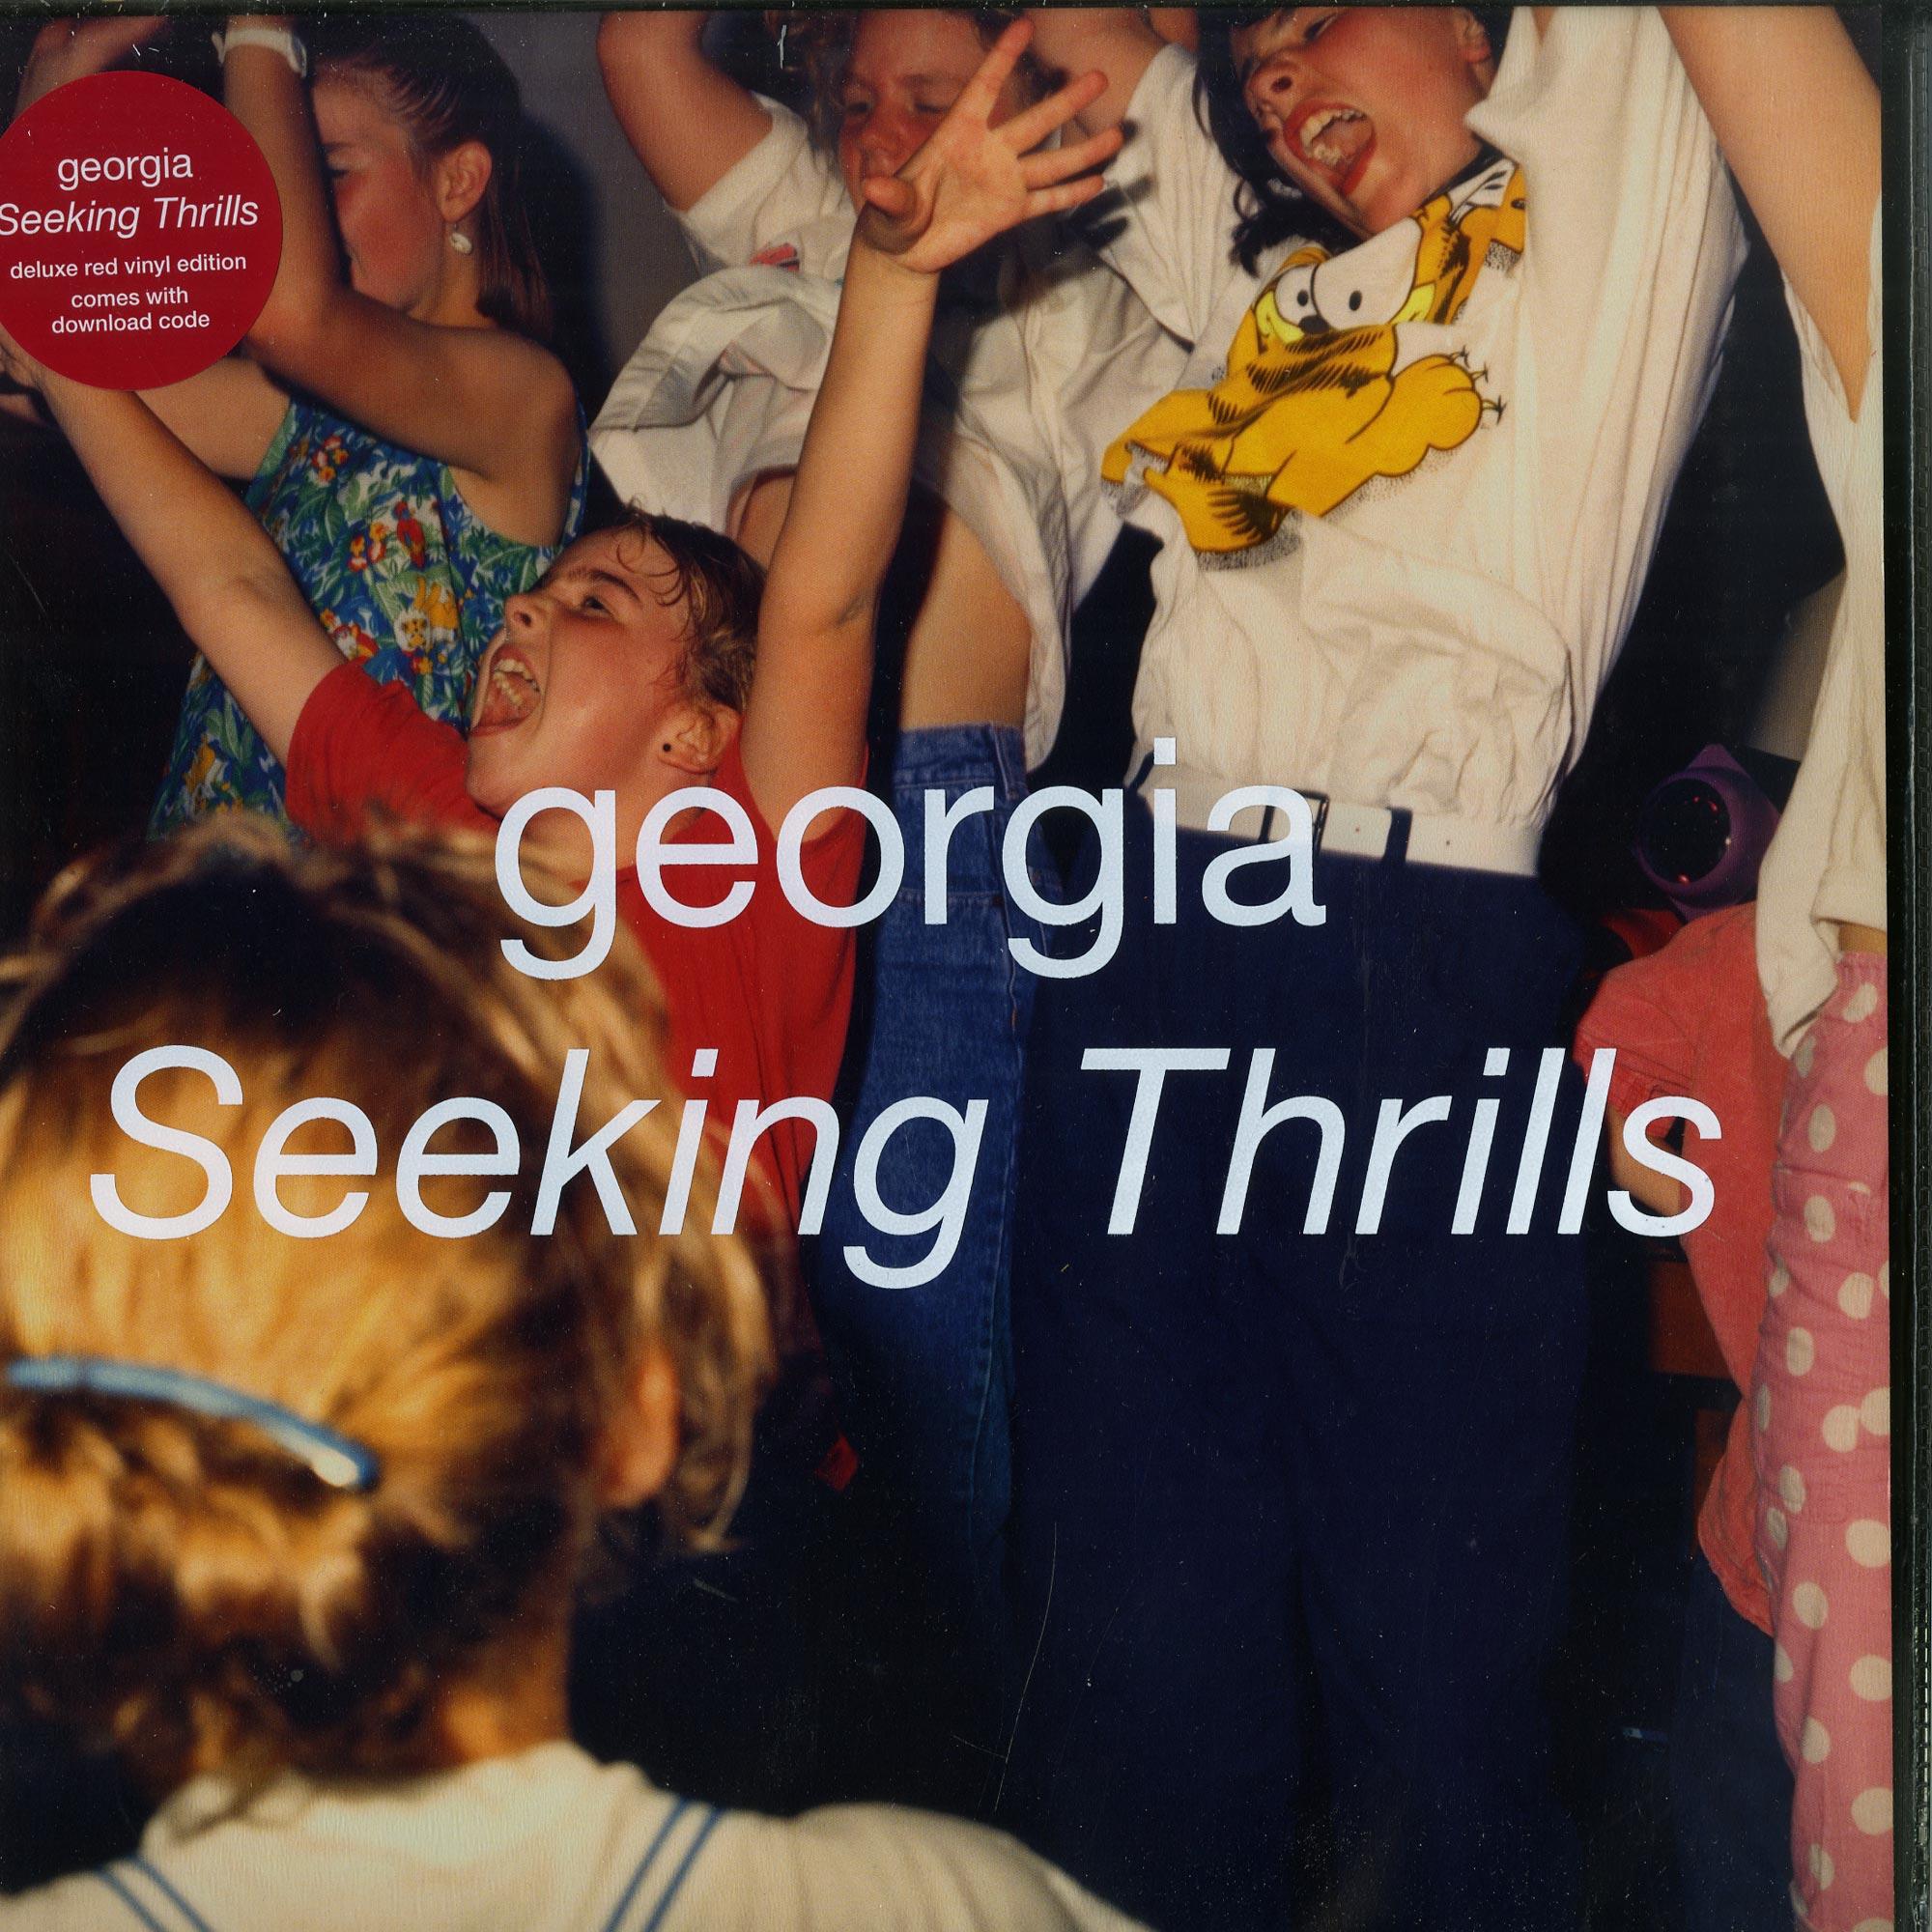 Georgia - SEEKING THRILLS